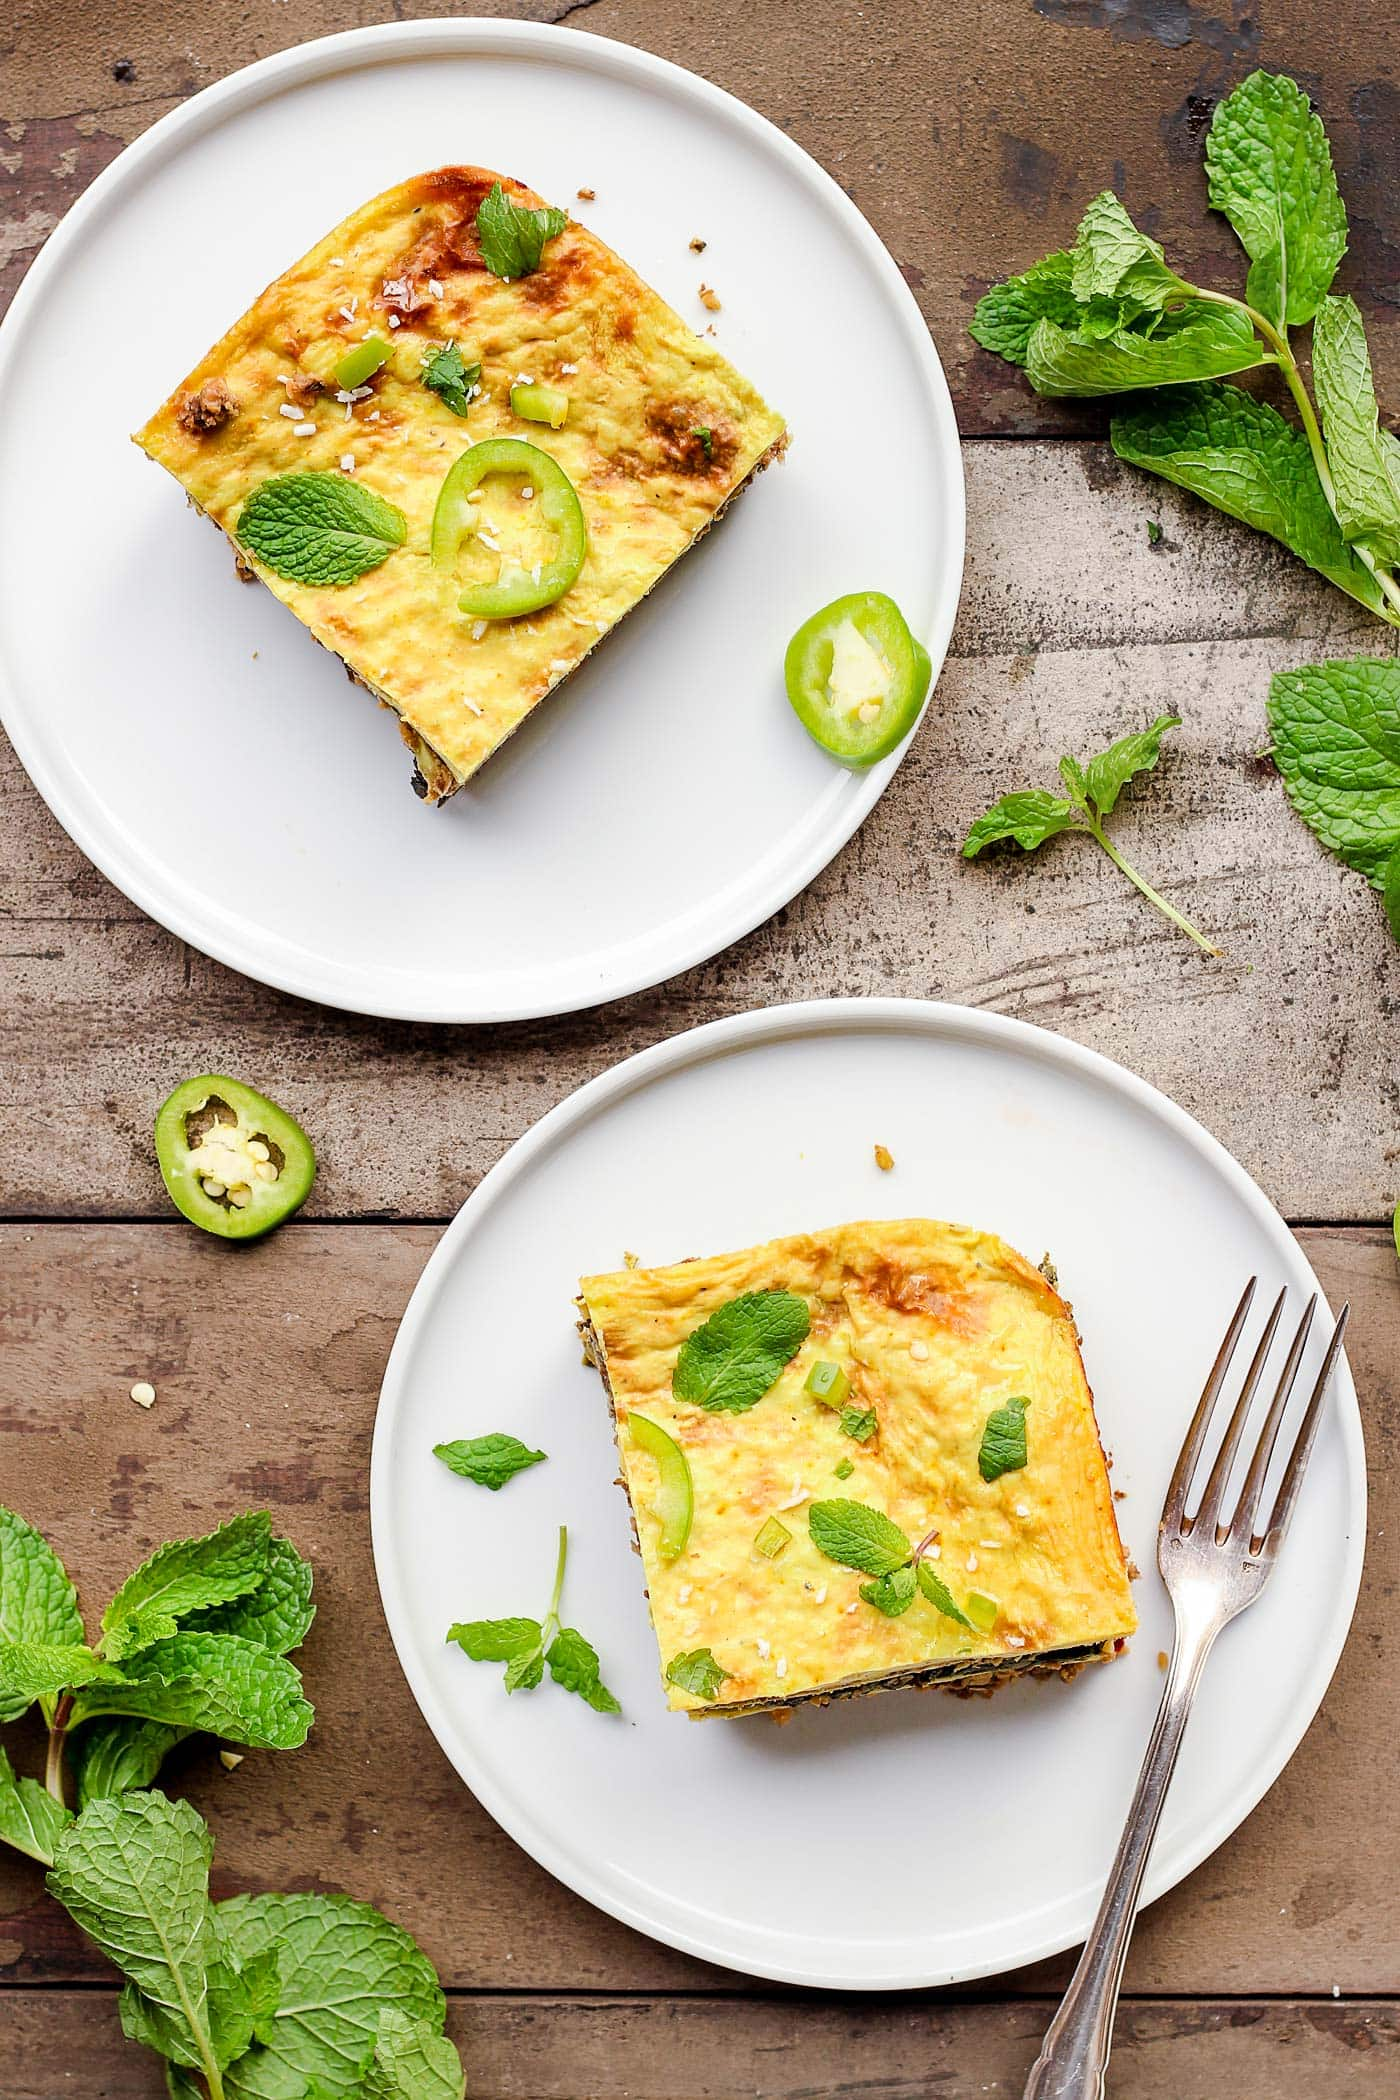 Vegan Spinach and Mint Lasagna